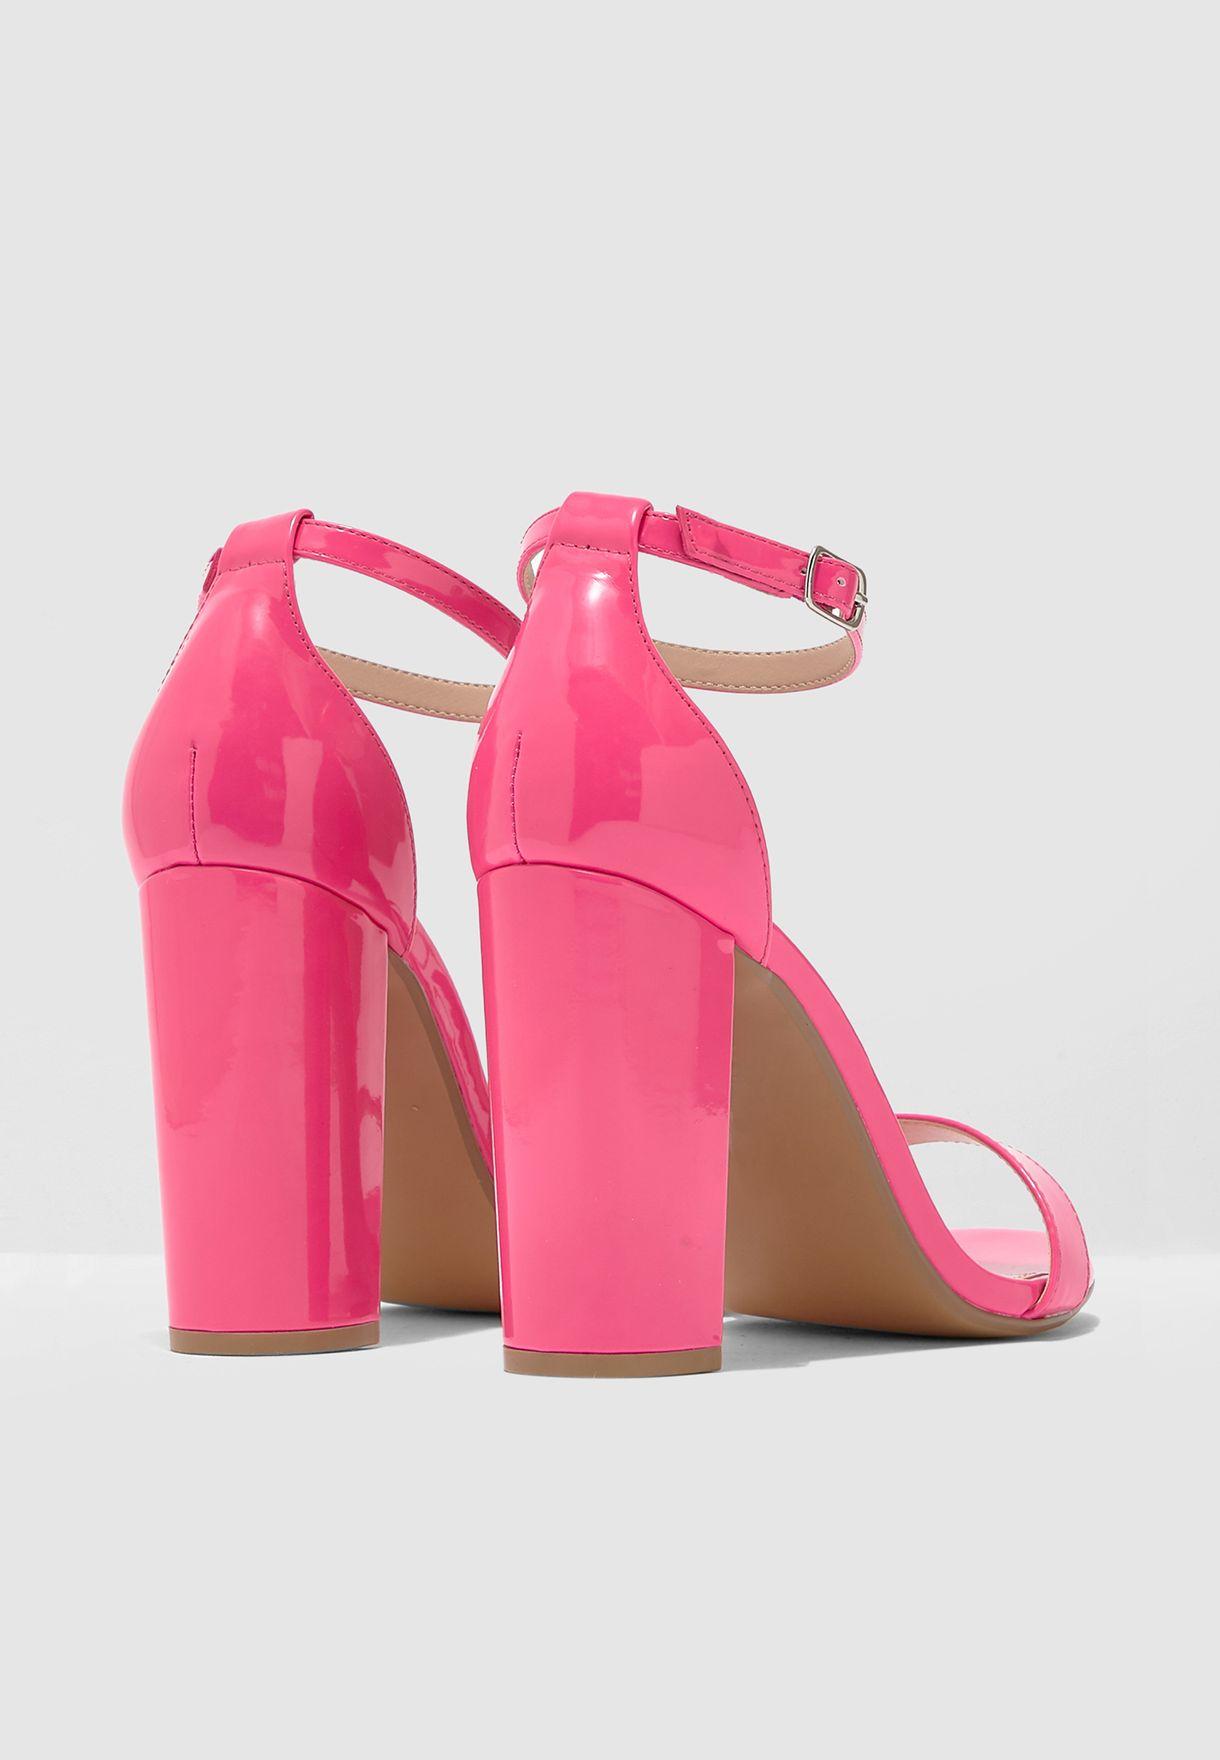 Carrson Heeled Sandals